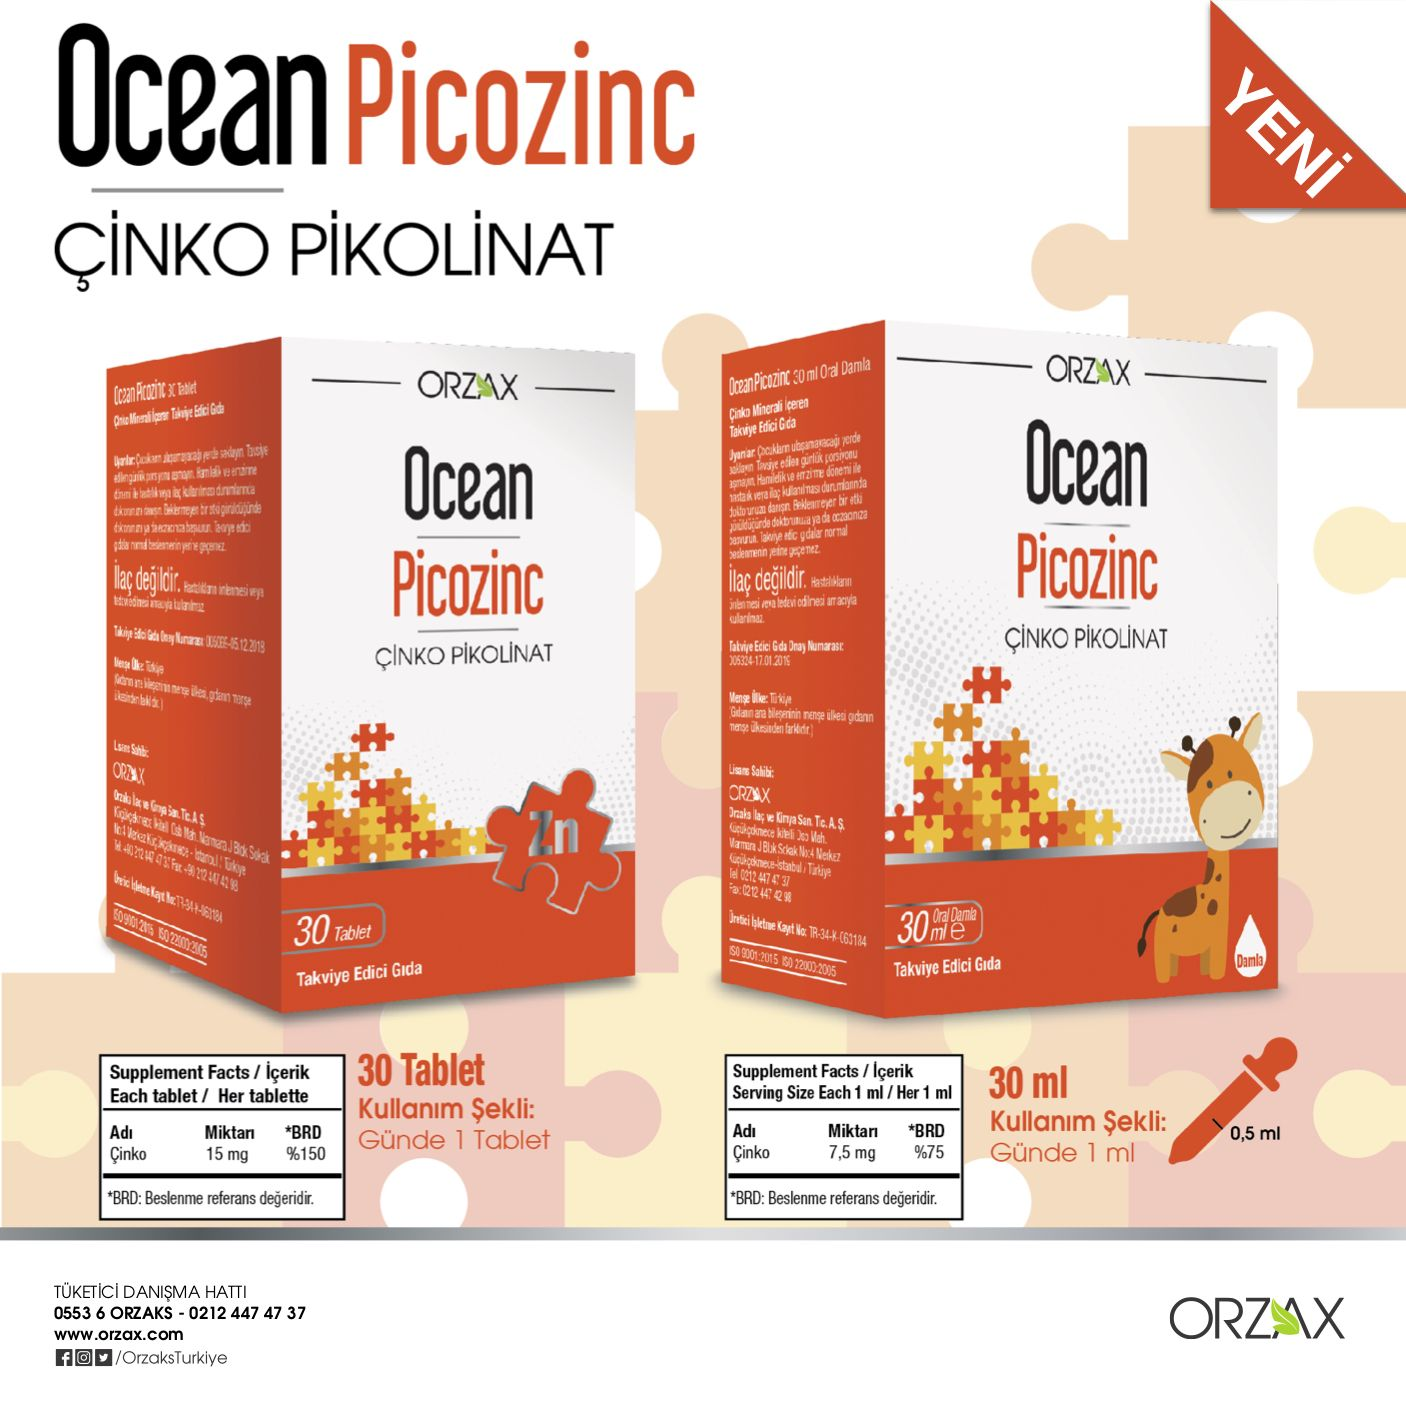 Ocean Picozinc Pikolinat Formda Cinko Icerir Pikolinat Form Cinko Emiliminde Yuksek Biyoyalarlanim Sagladigi Kanitlanmis Bir Formdur Instagram Lime